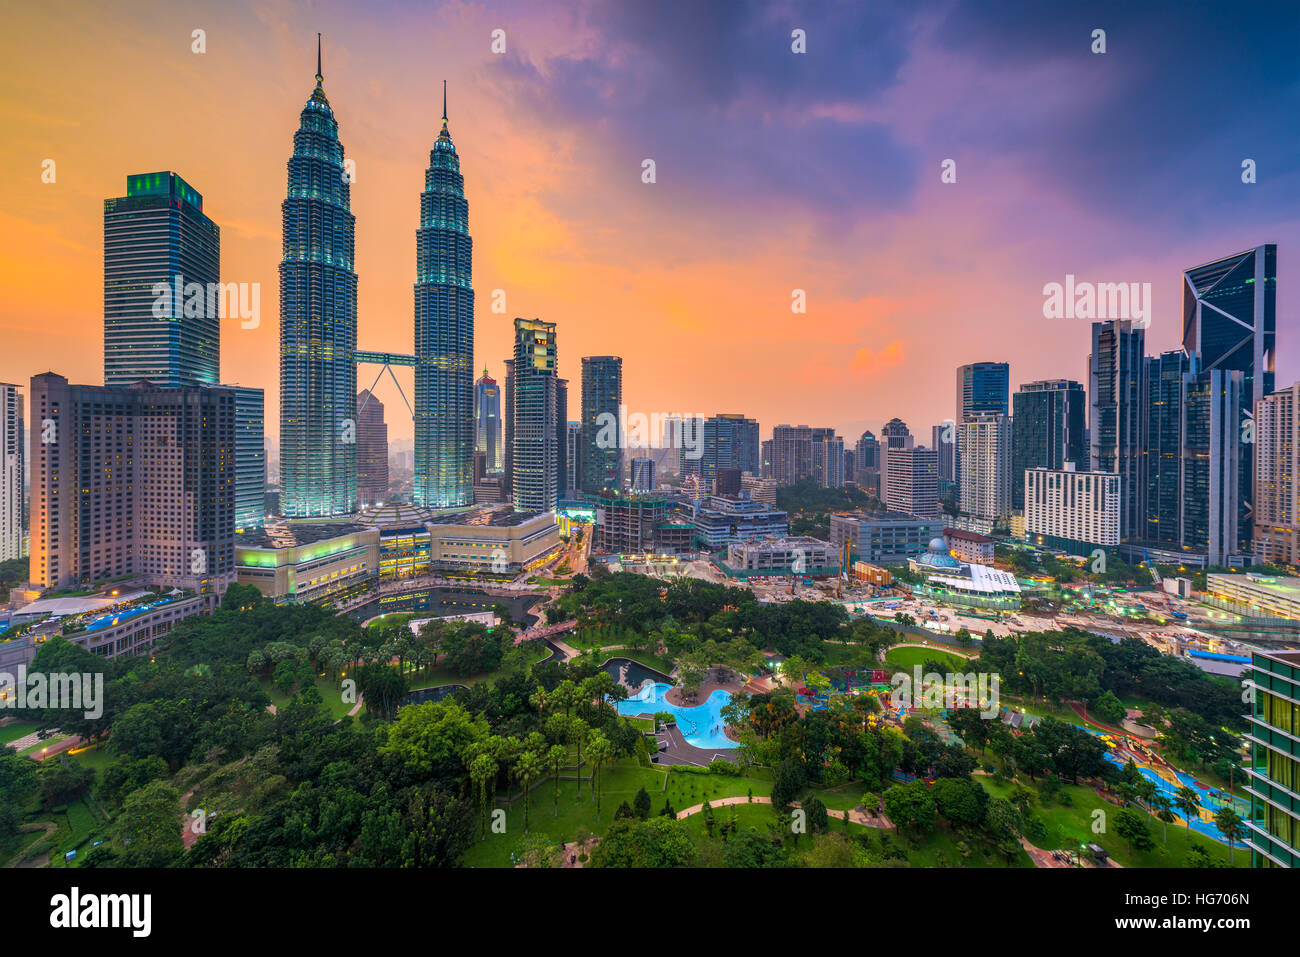 Kuala Lumpur, Malaysia Skyline in der Abenddämmerung über den Park. Stockbild